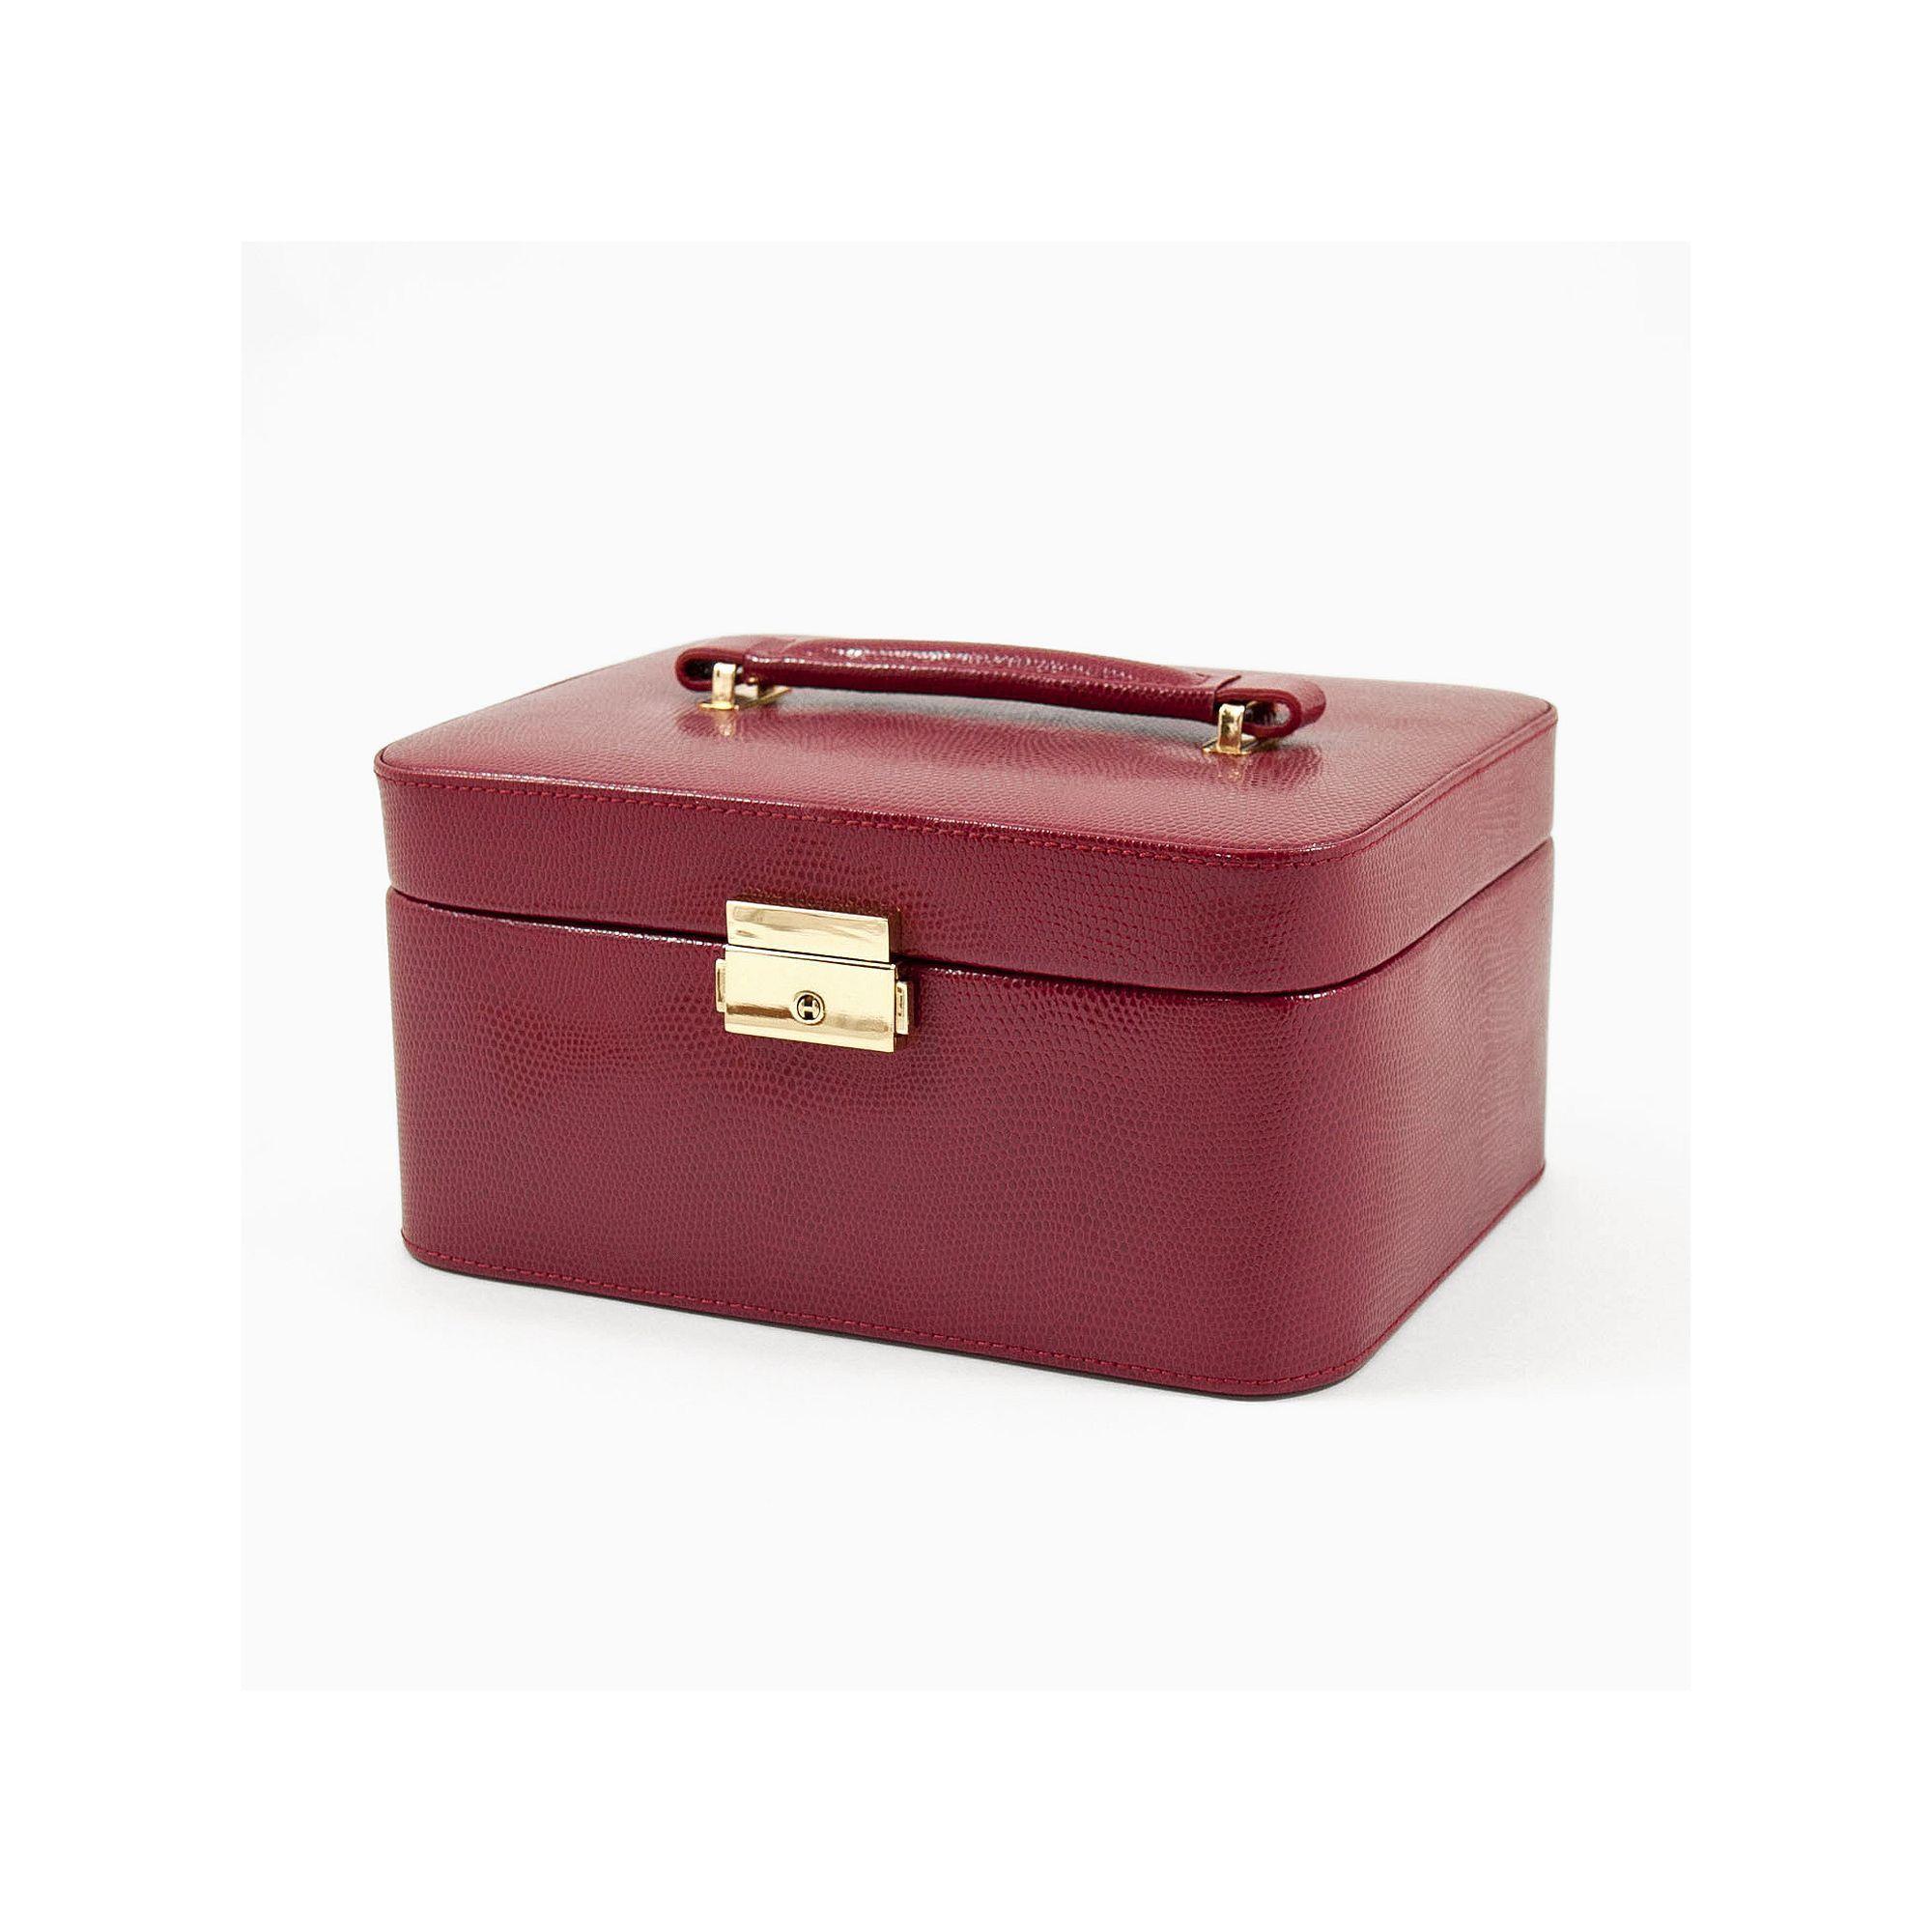 BeyBerk Lizard Leather Jewelry Box Valet and Travel Case Set Red